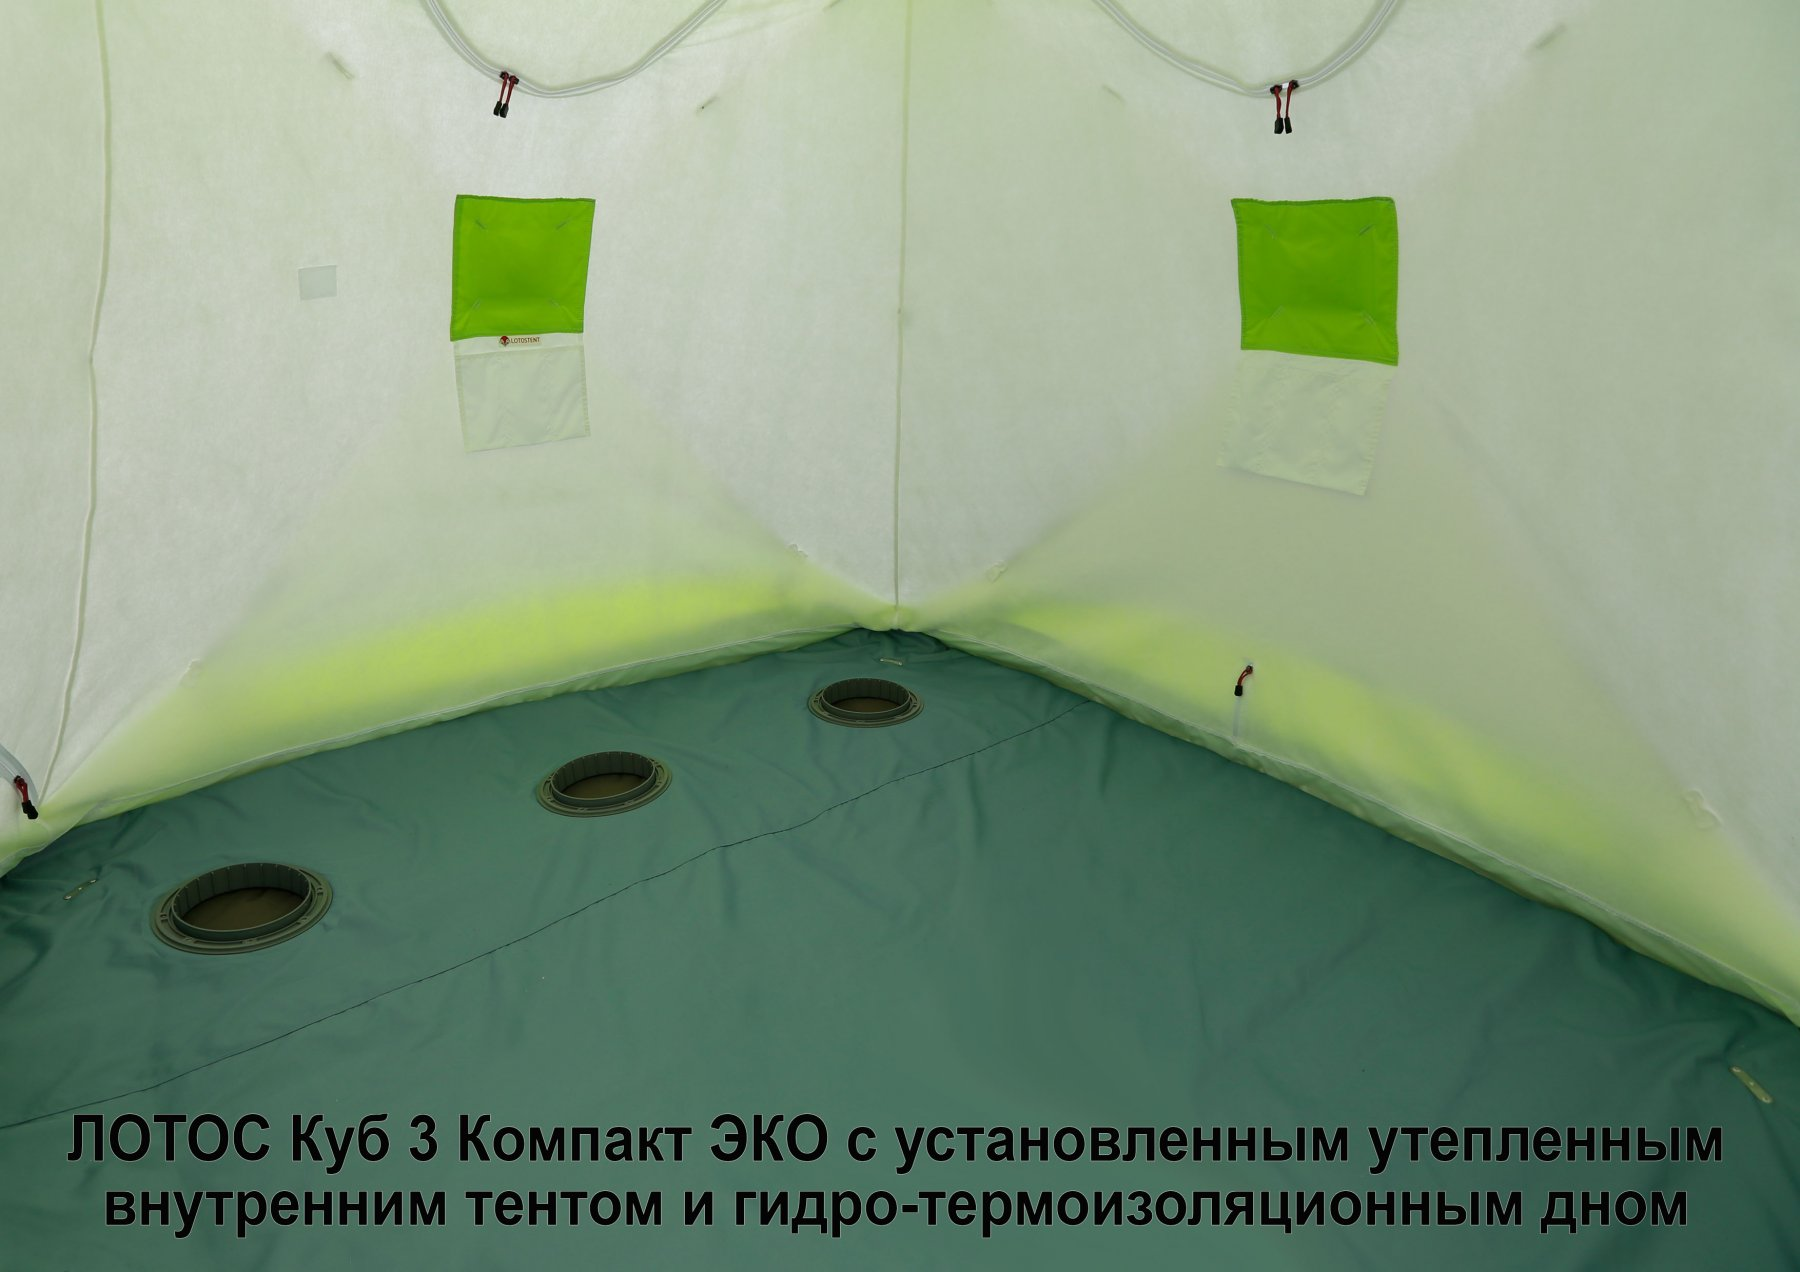 Зимняя палатка ЛОТОС Куб 3 Компакт ЭКО (гидро-термоизоляционное дно и внутренний тент)